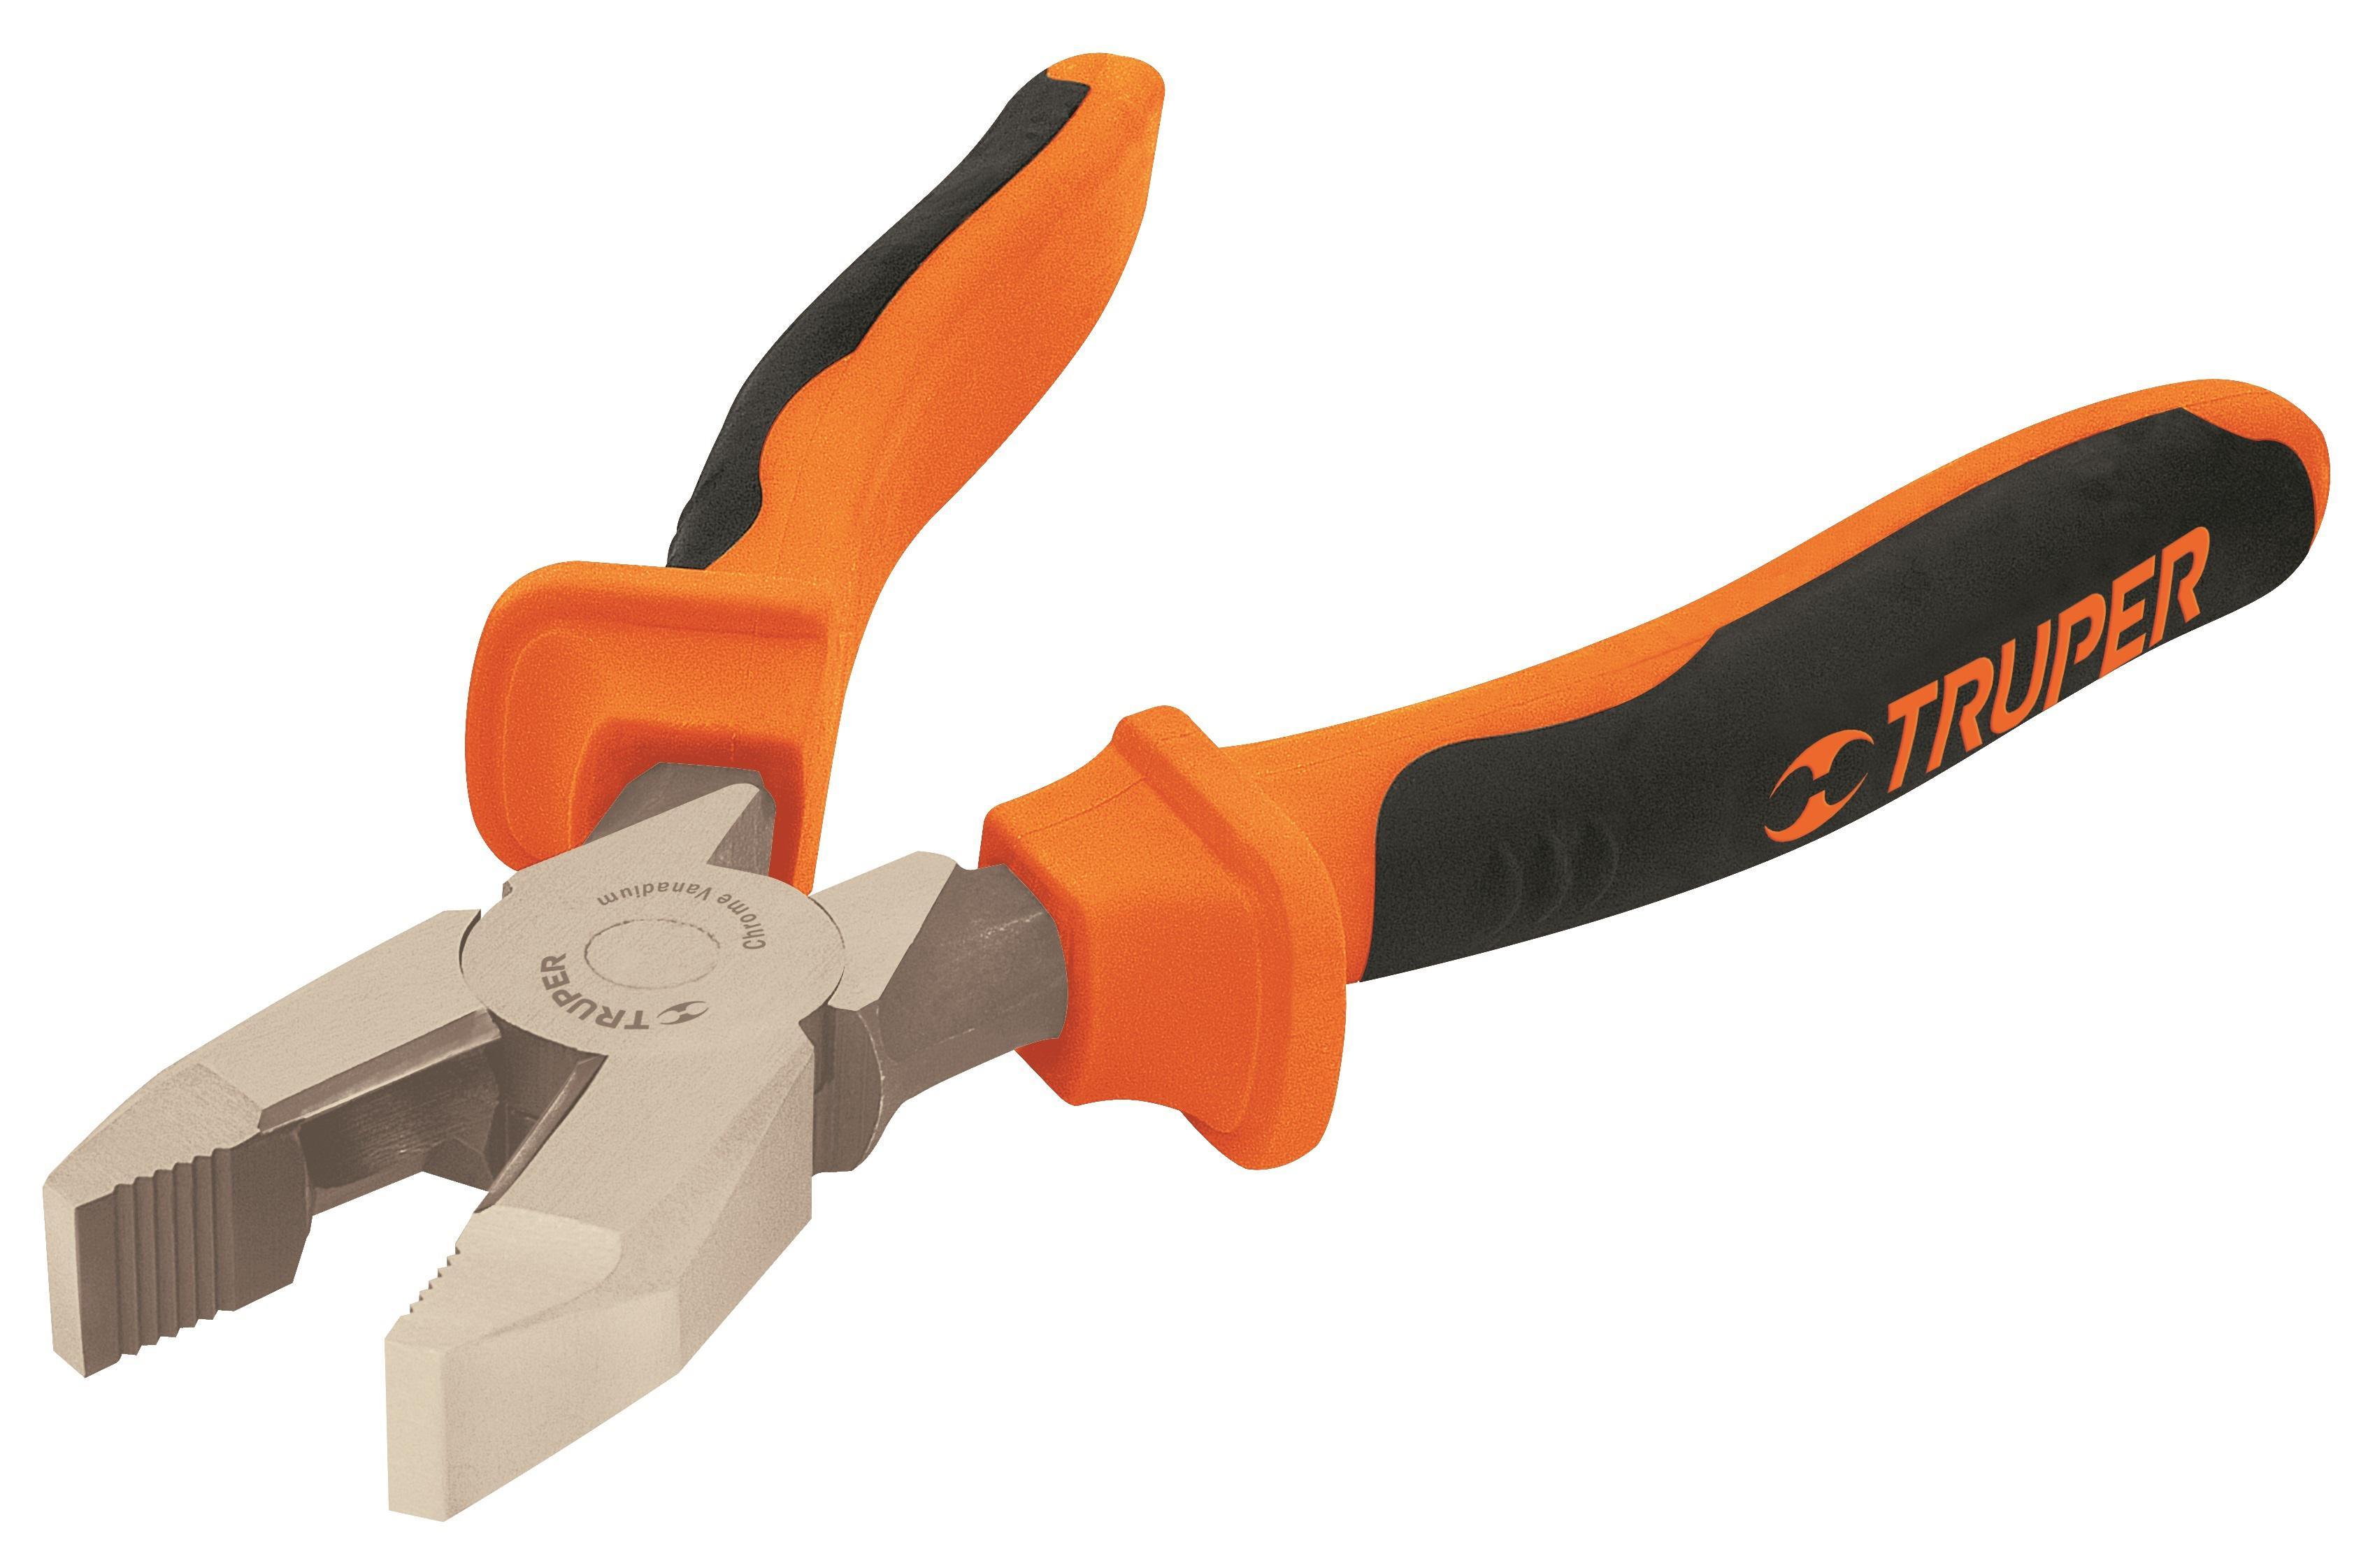 Плоскогубцы диэлектрические Truper T200-8x 12350 инструмент truper т 12835